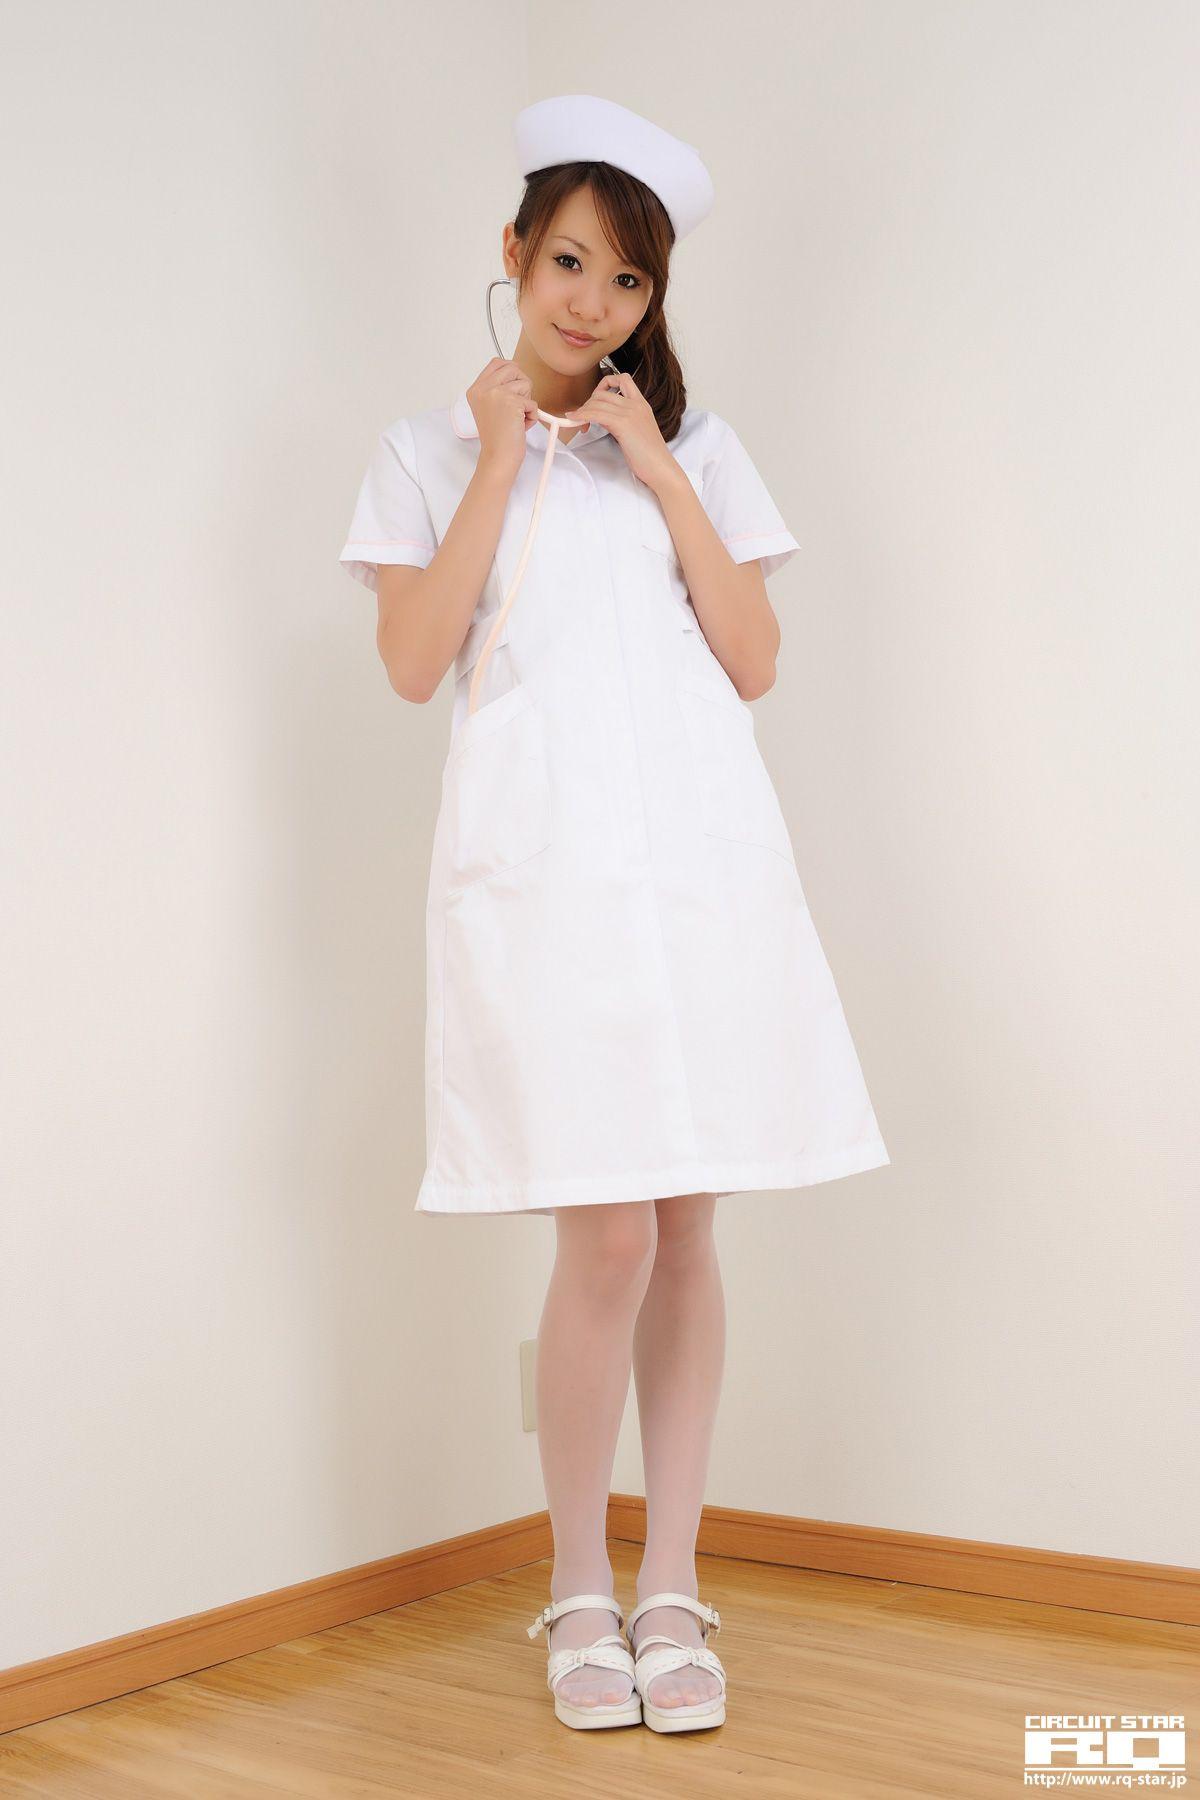 [RQ STAR美女] NO.0427 Saki Ueda 植田早紀 Nurse Costume[83P] RQ STAR 第1张